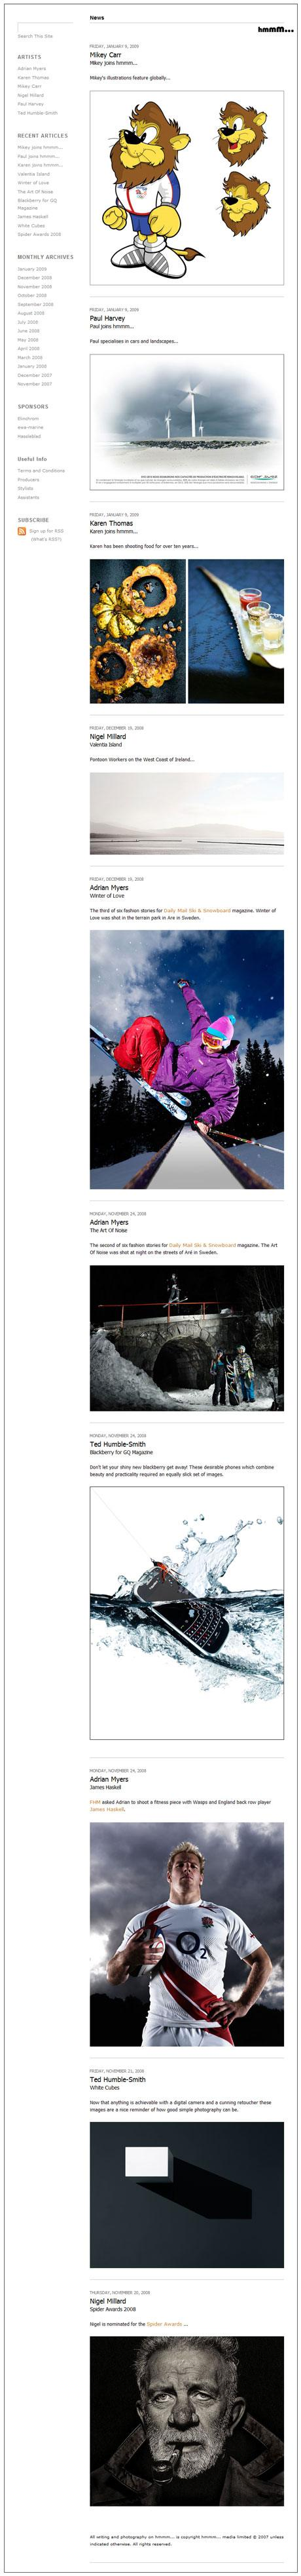 hmmm... news main page